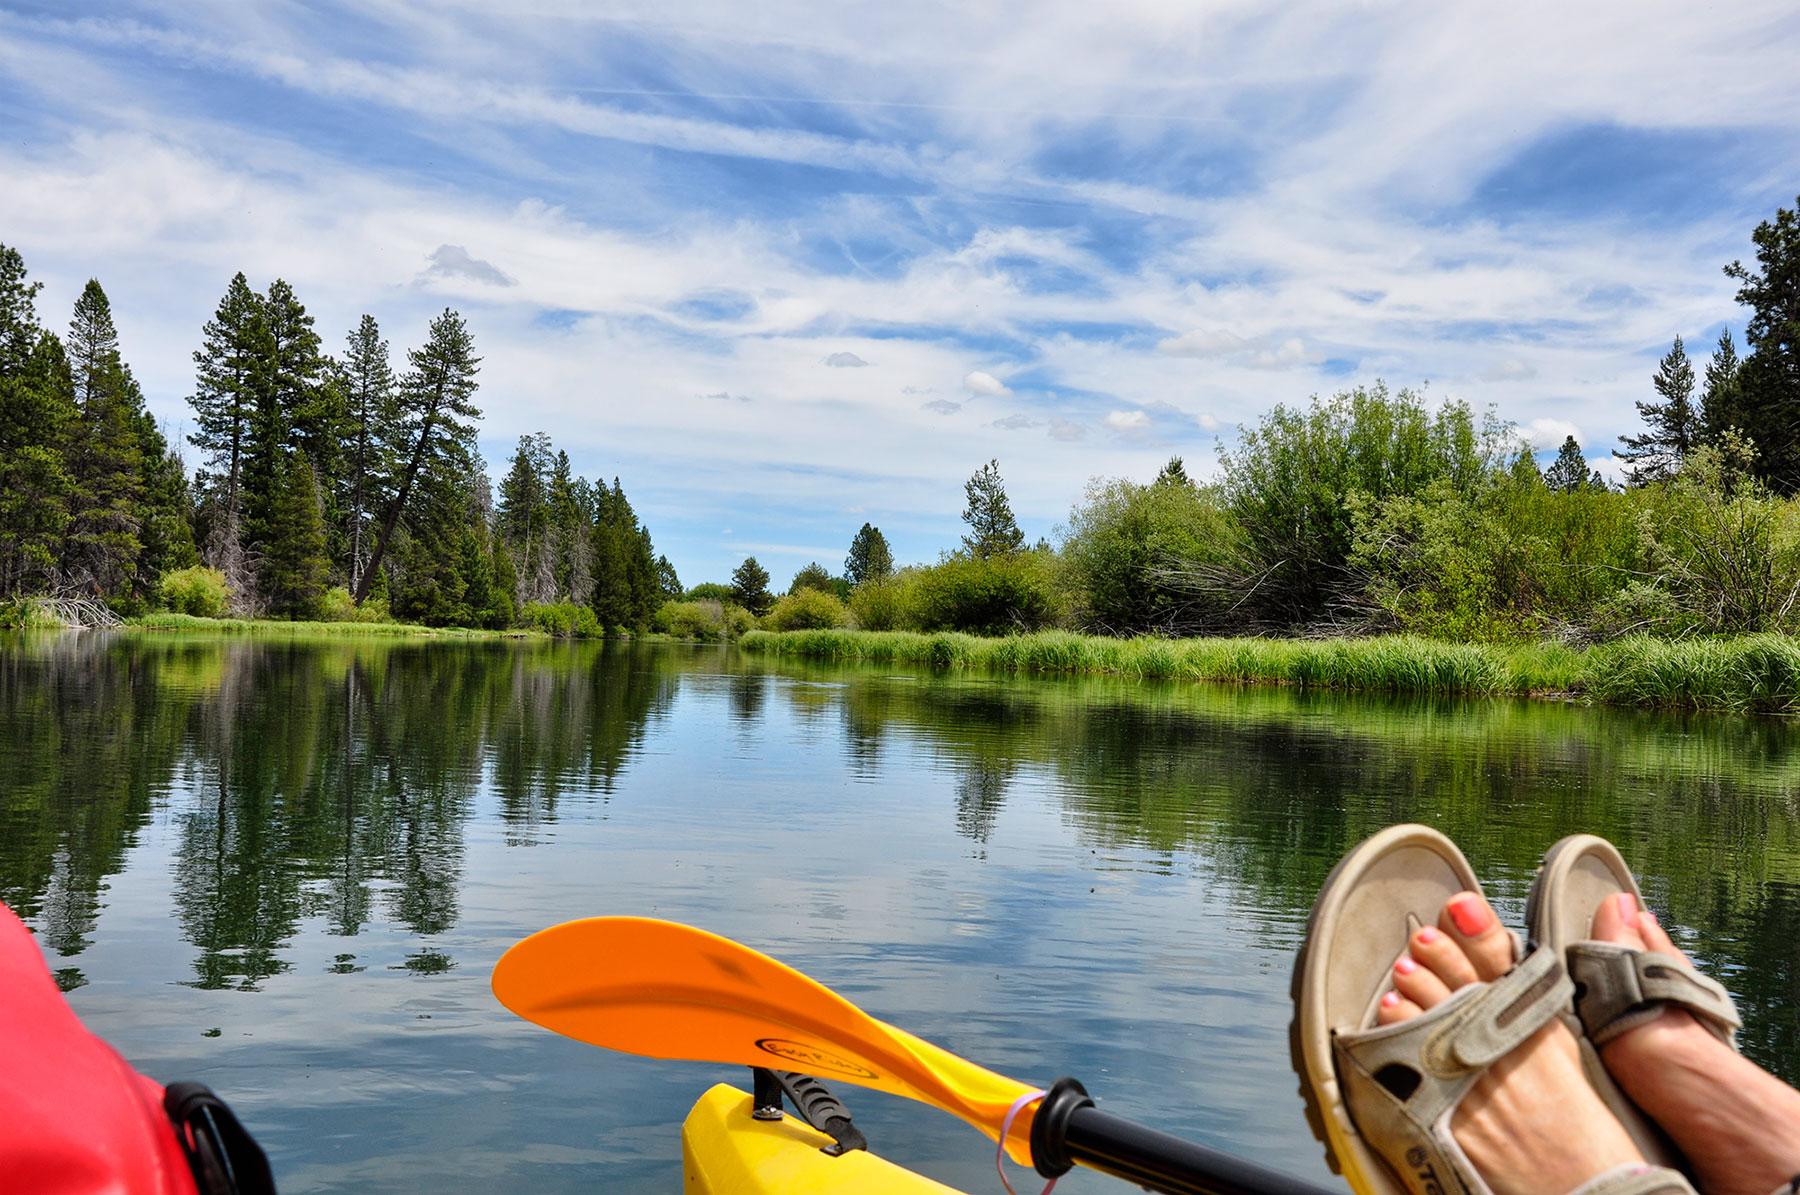 Floating the Deschutes near Bend, Oregon